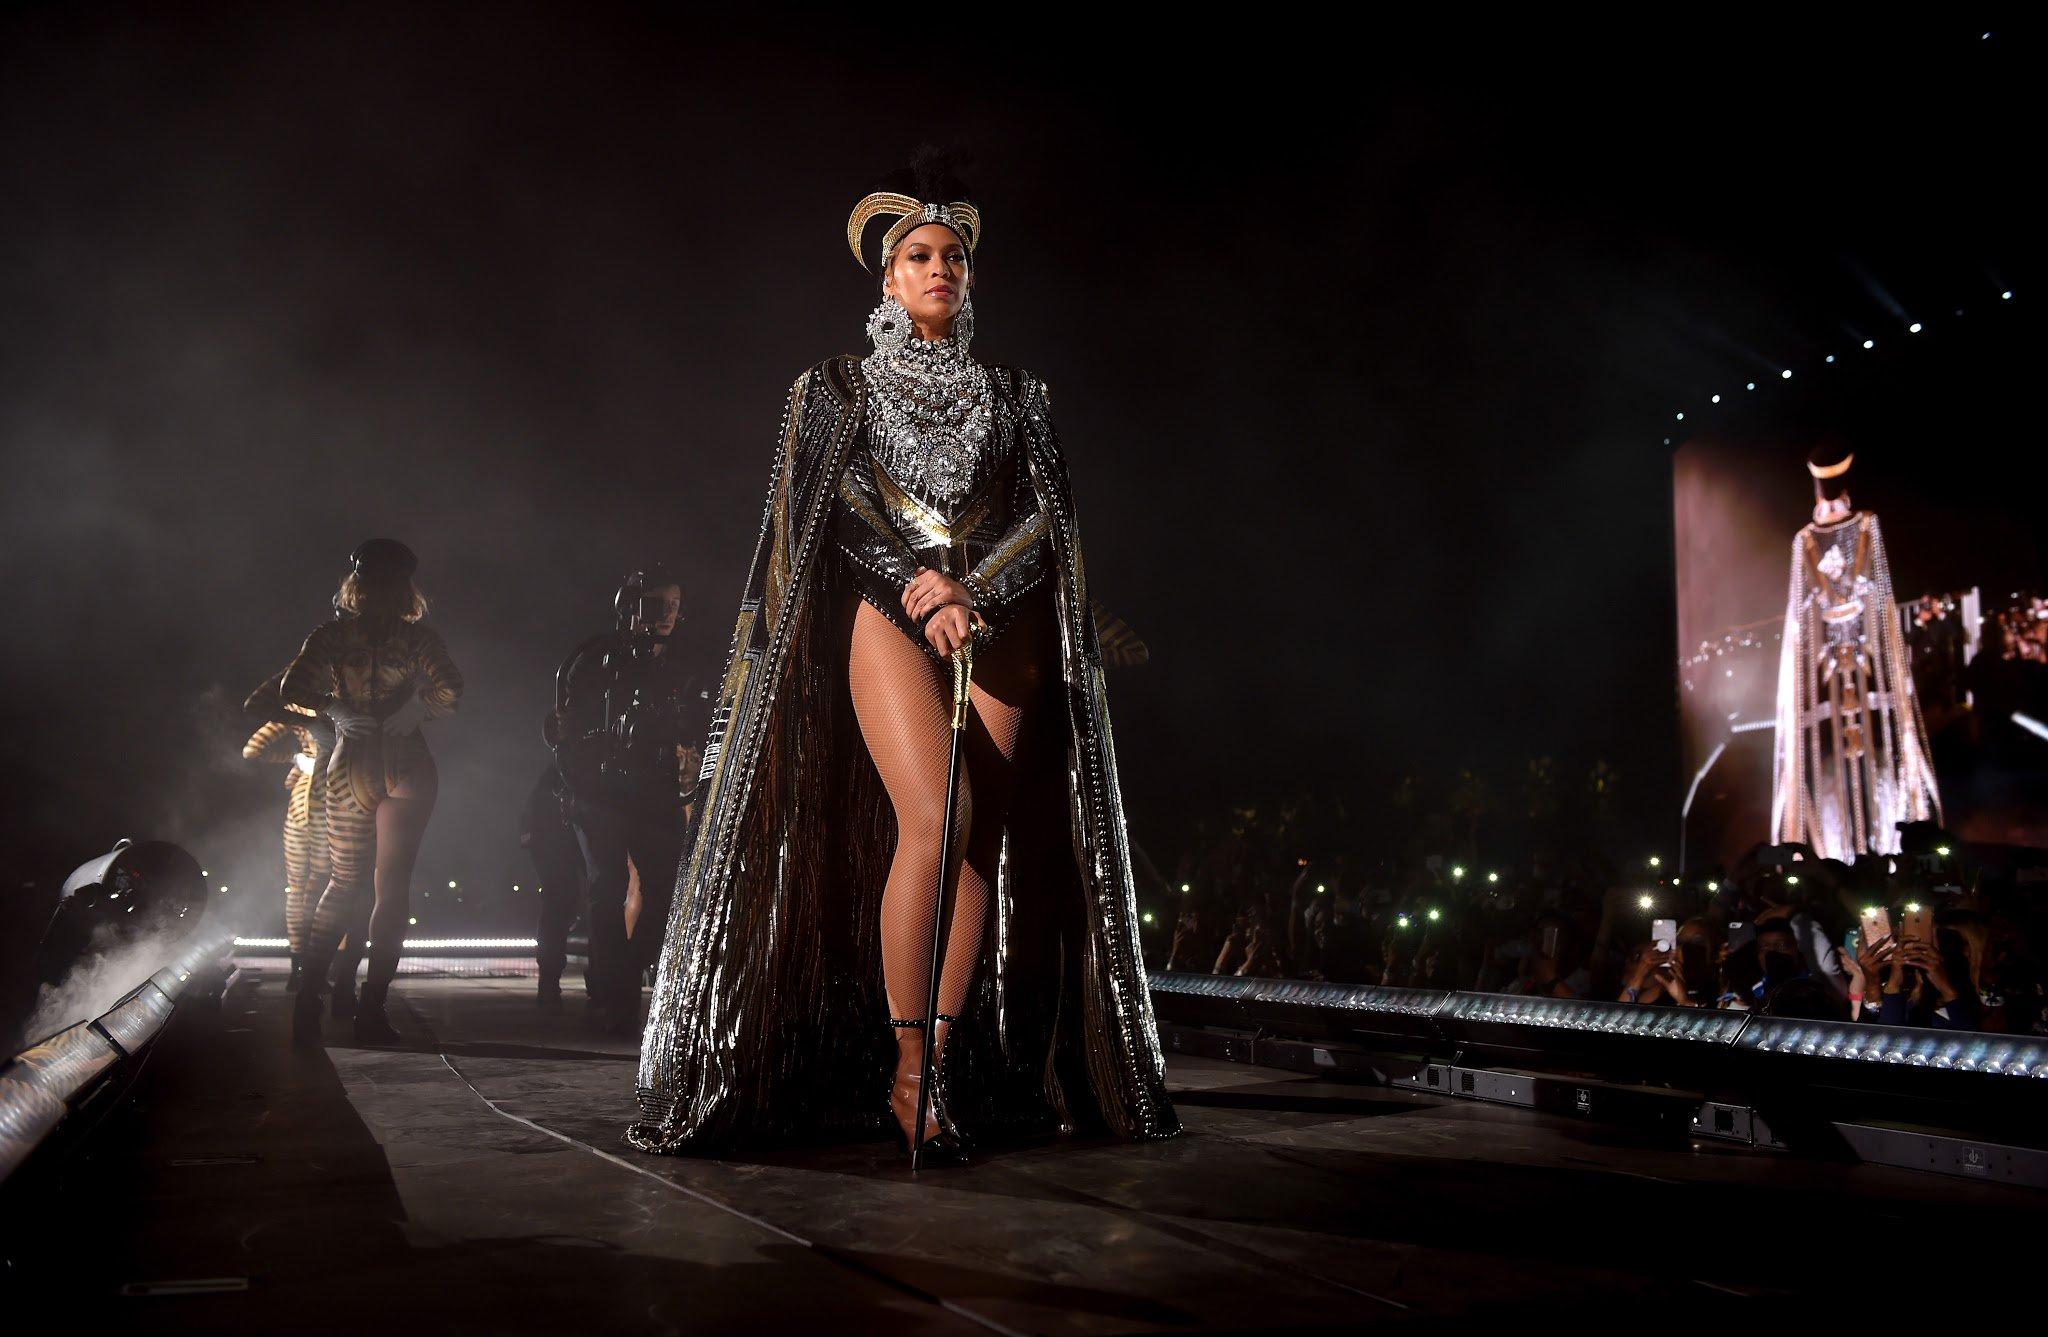 Lemonade is back in the top ten on iTunes after Beyoncé's Coachella performance. https://t.co/jH3T0BUdfC https://t.co/dW5vCUY60k